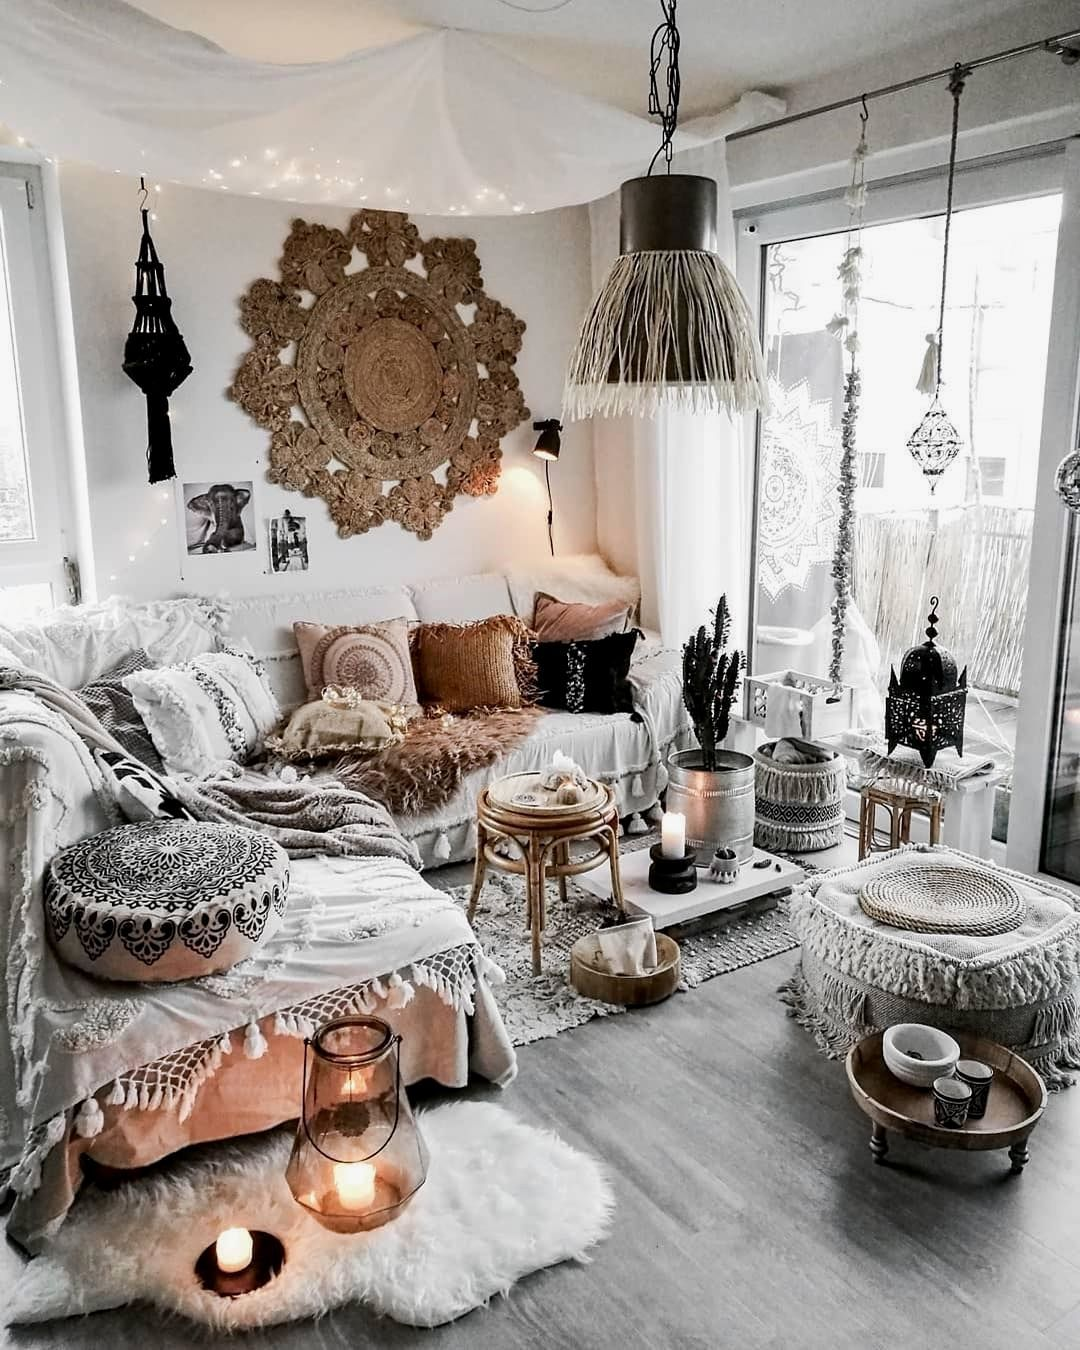 Cheap Home Decor Crafts Saleprice 20 Bohemian Living Room Decor Hygge Living Room Hygge Living